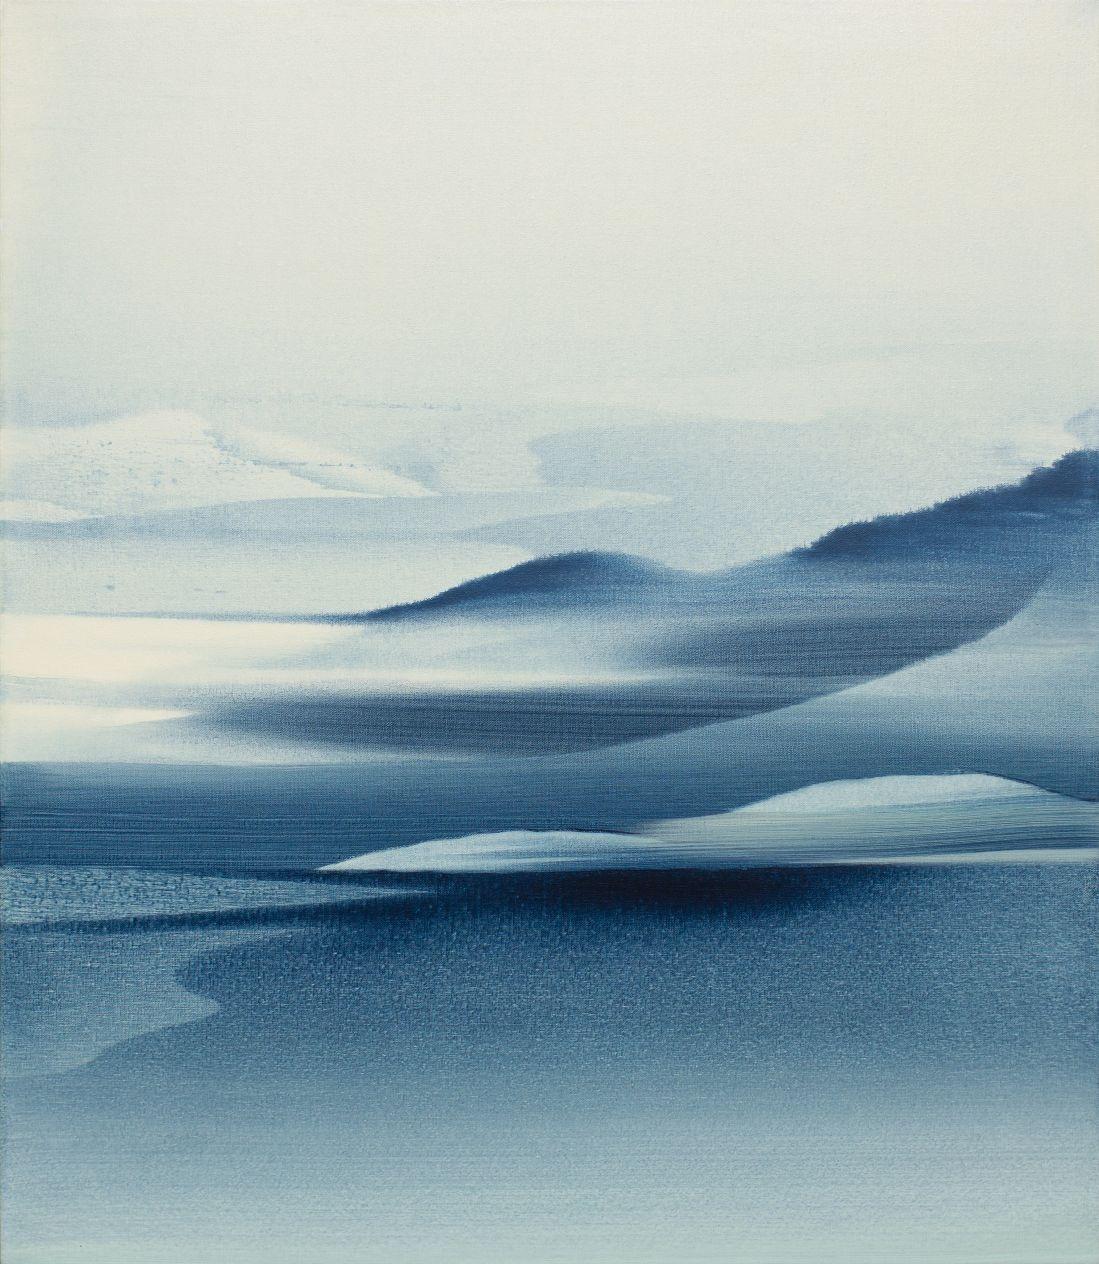 Enter the abstract - Lot 21, Eva Ullrich, Floe